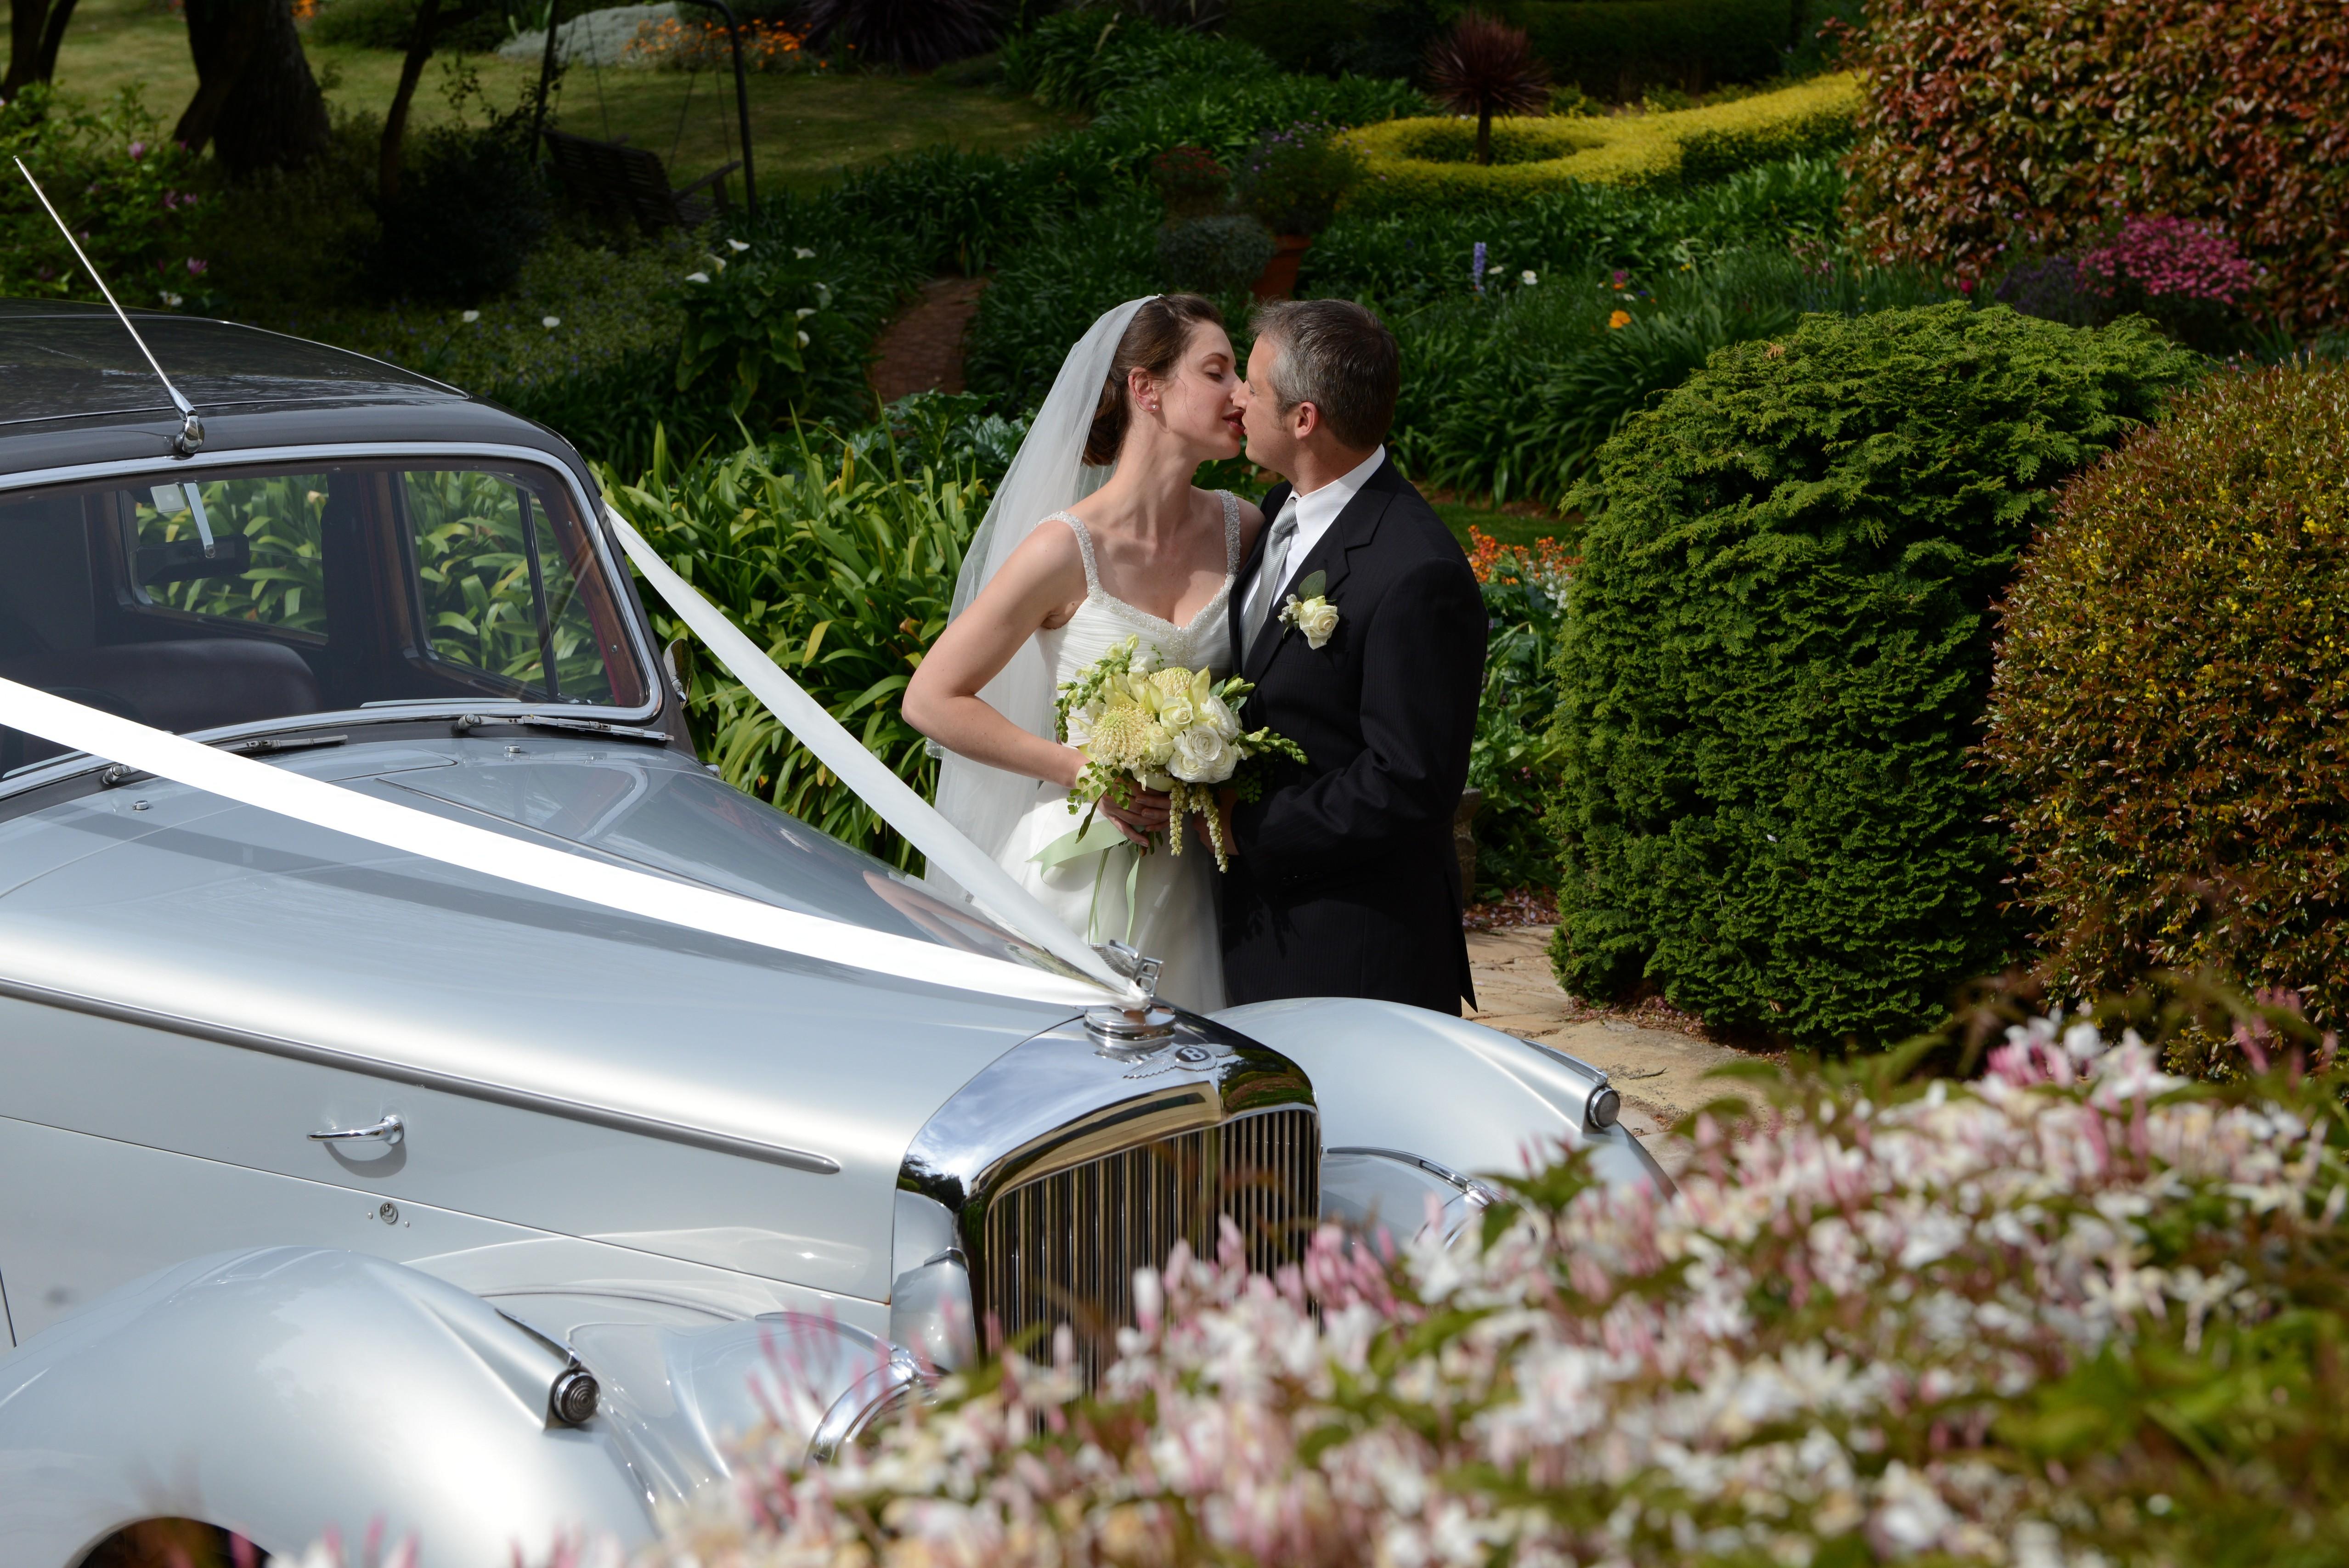 couple, kiss, car, gardens